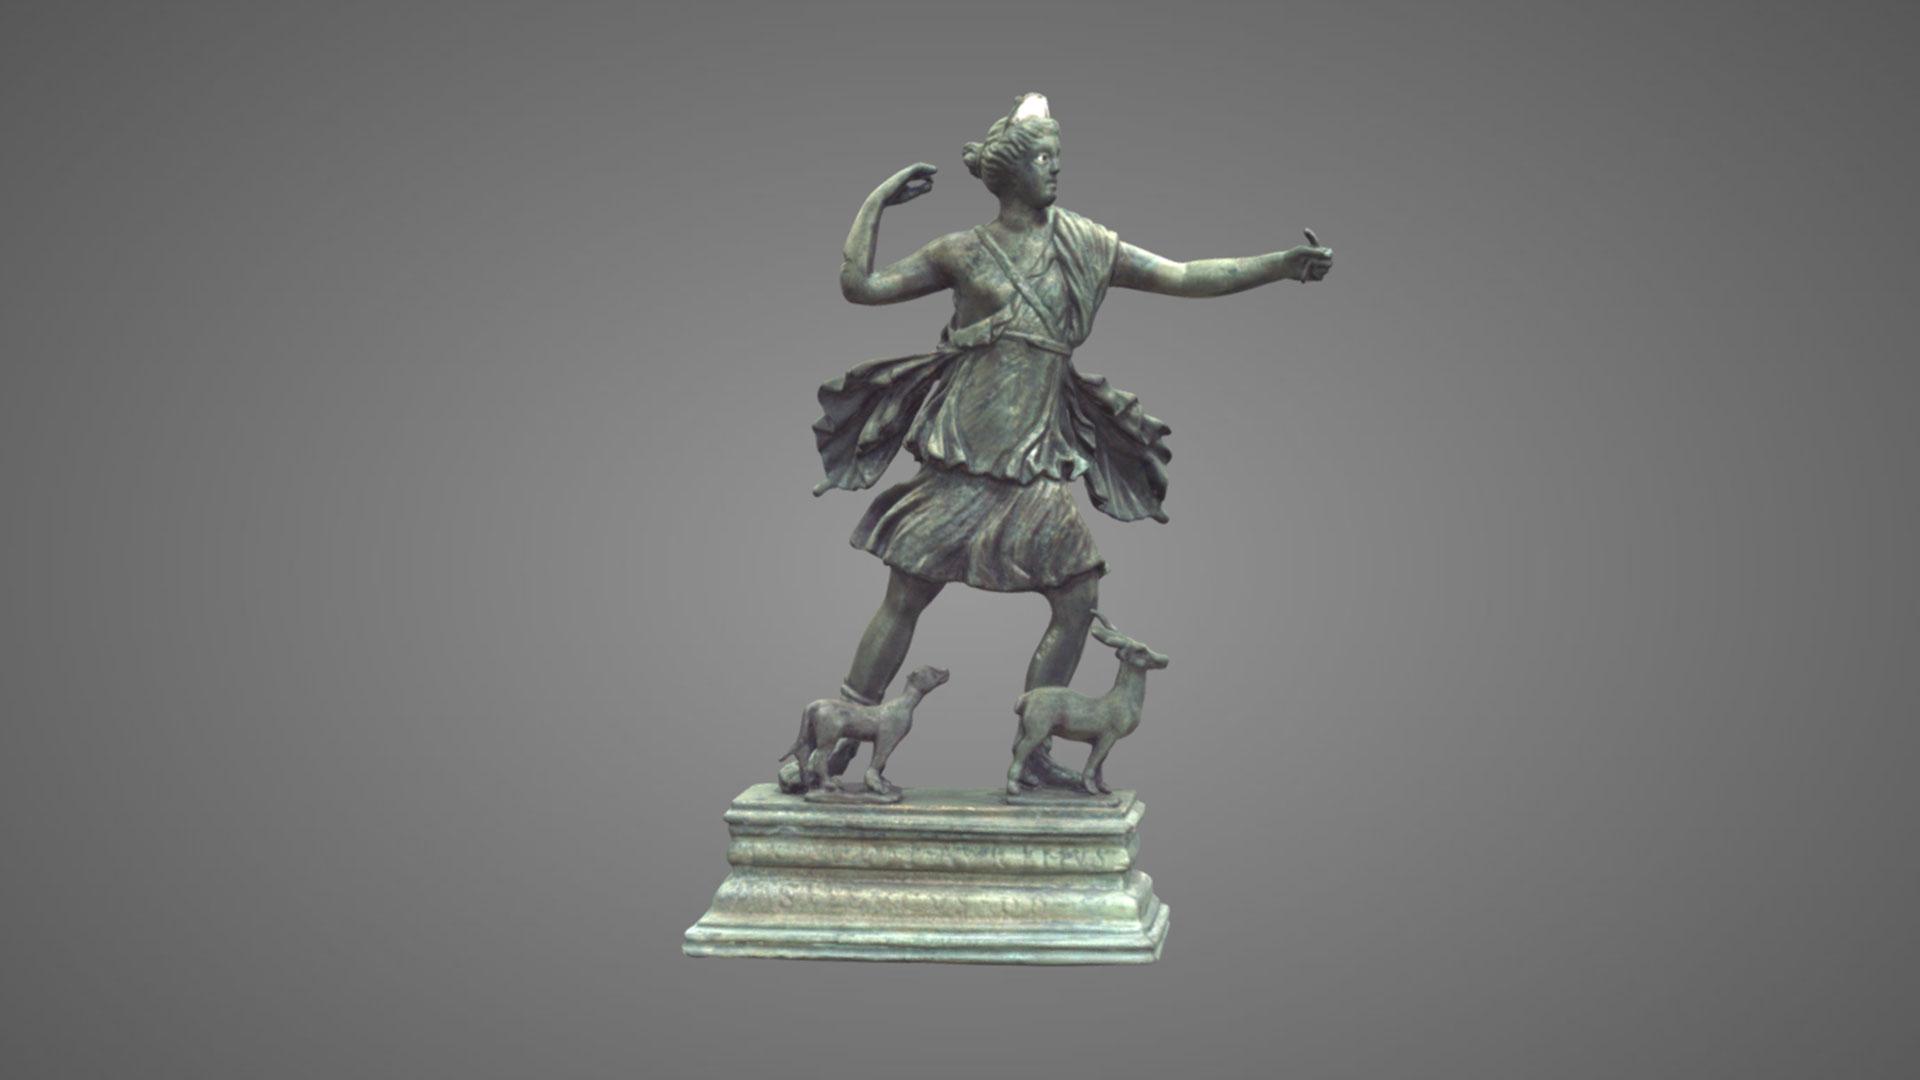 Statuetta raffigurante Diana cacciatrice - 3D Model